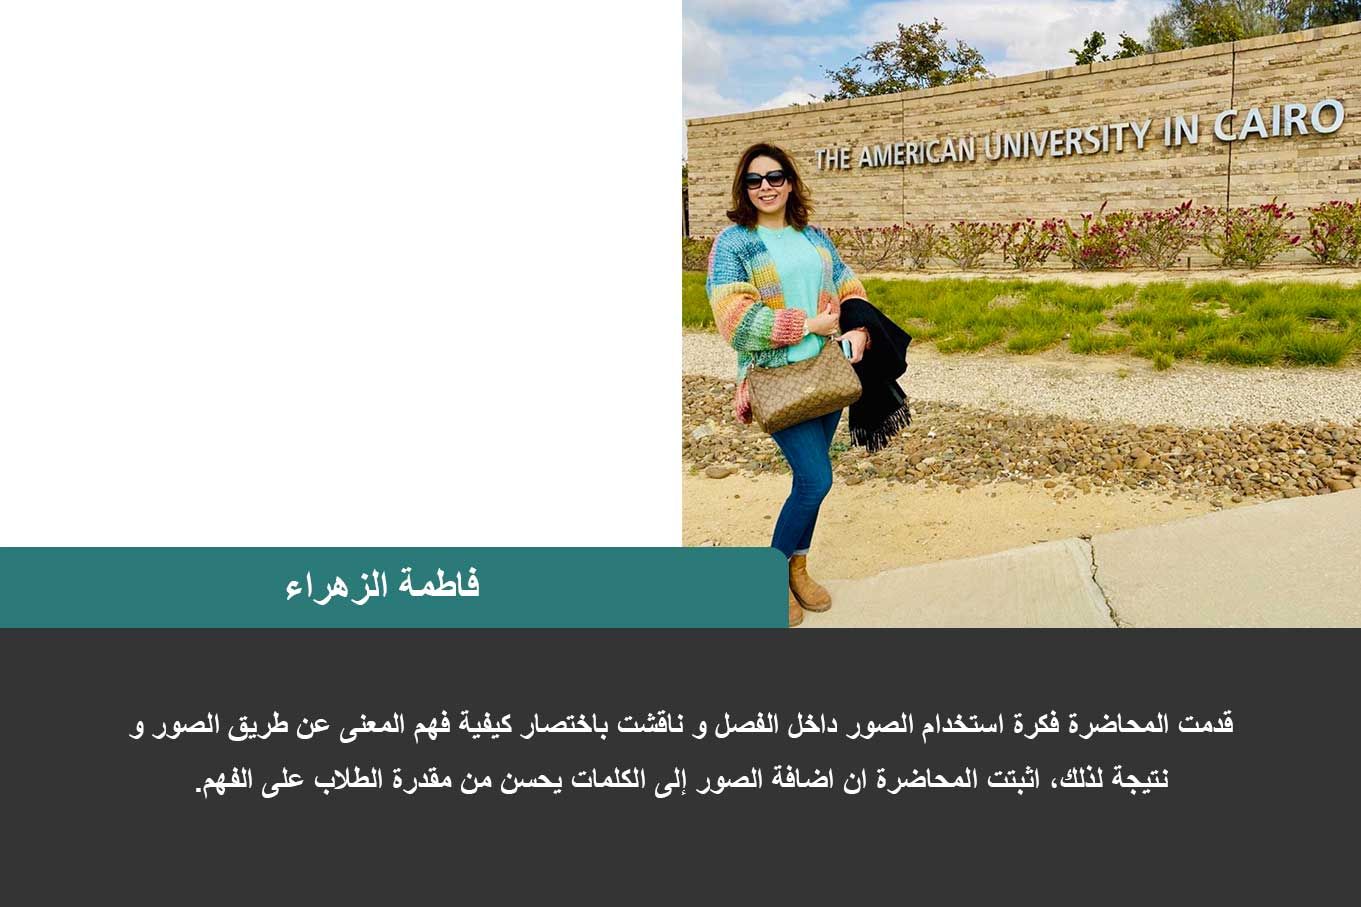 Fatma Elzahraa